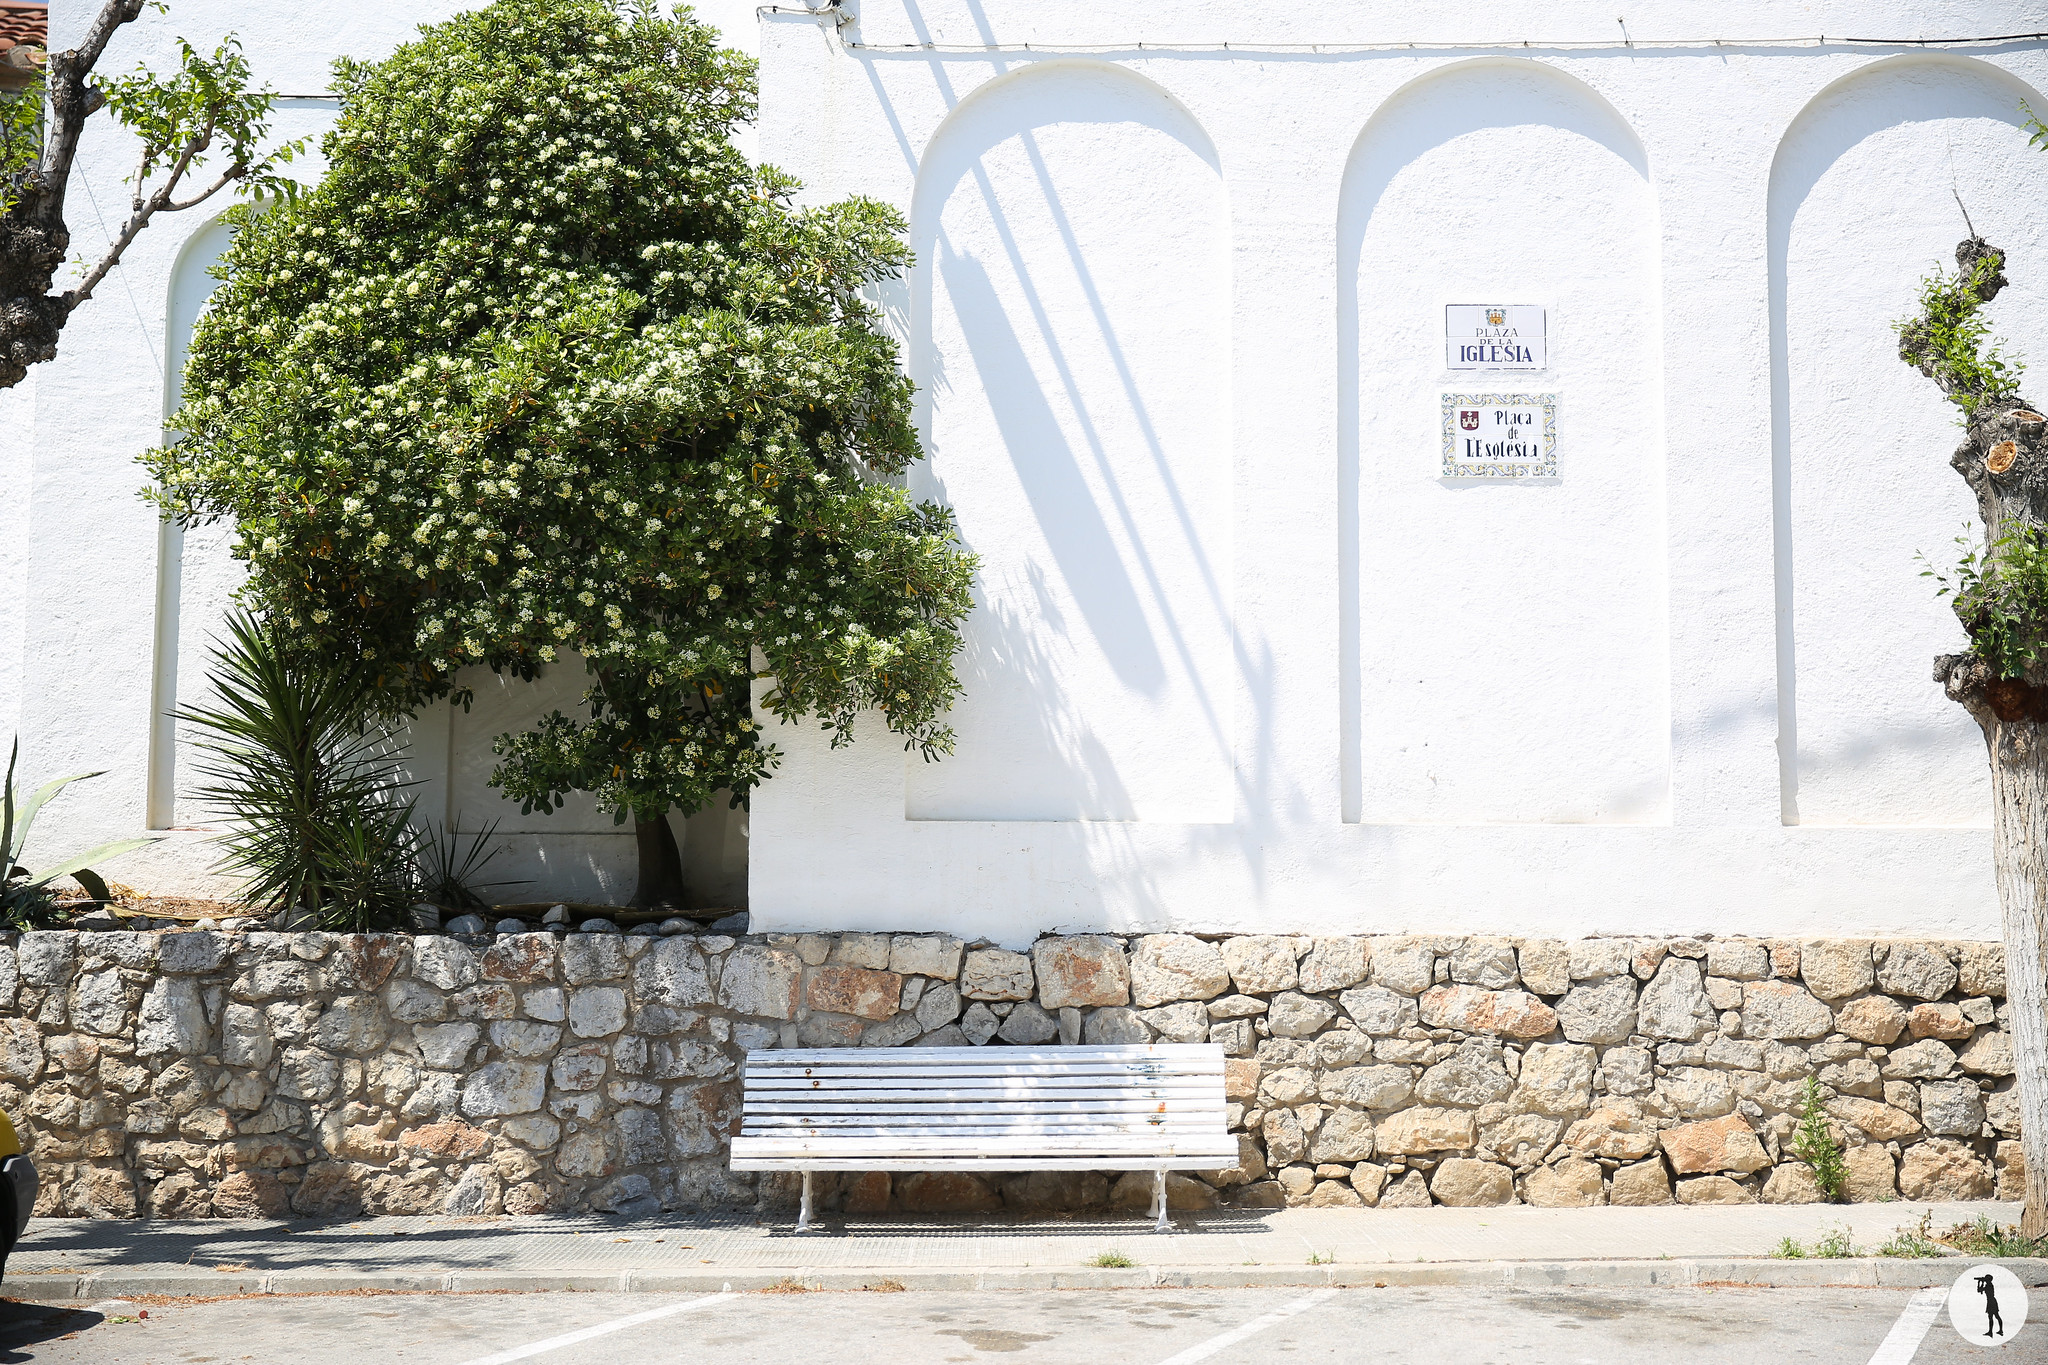 Garraf, Spain